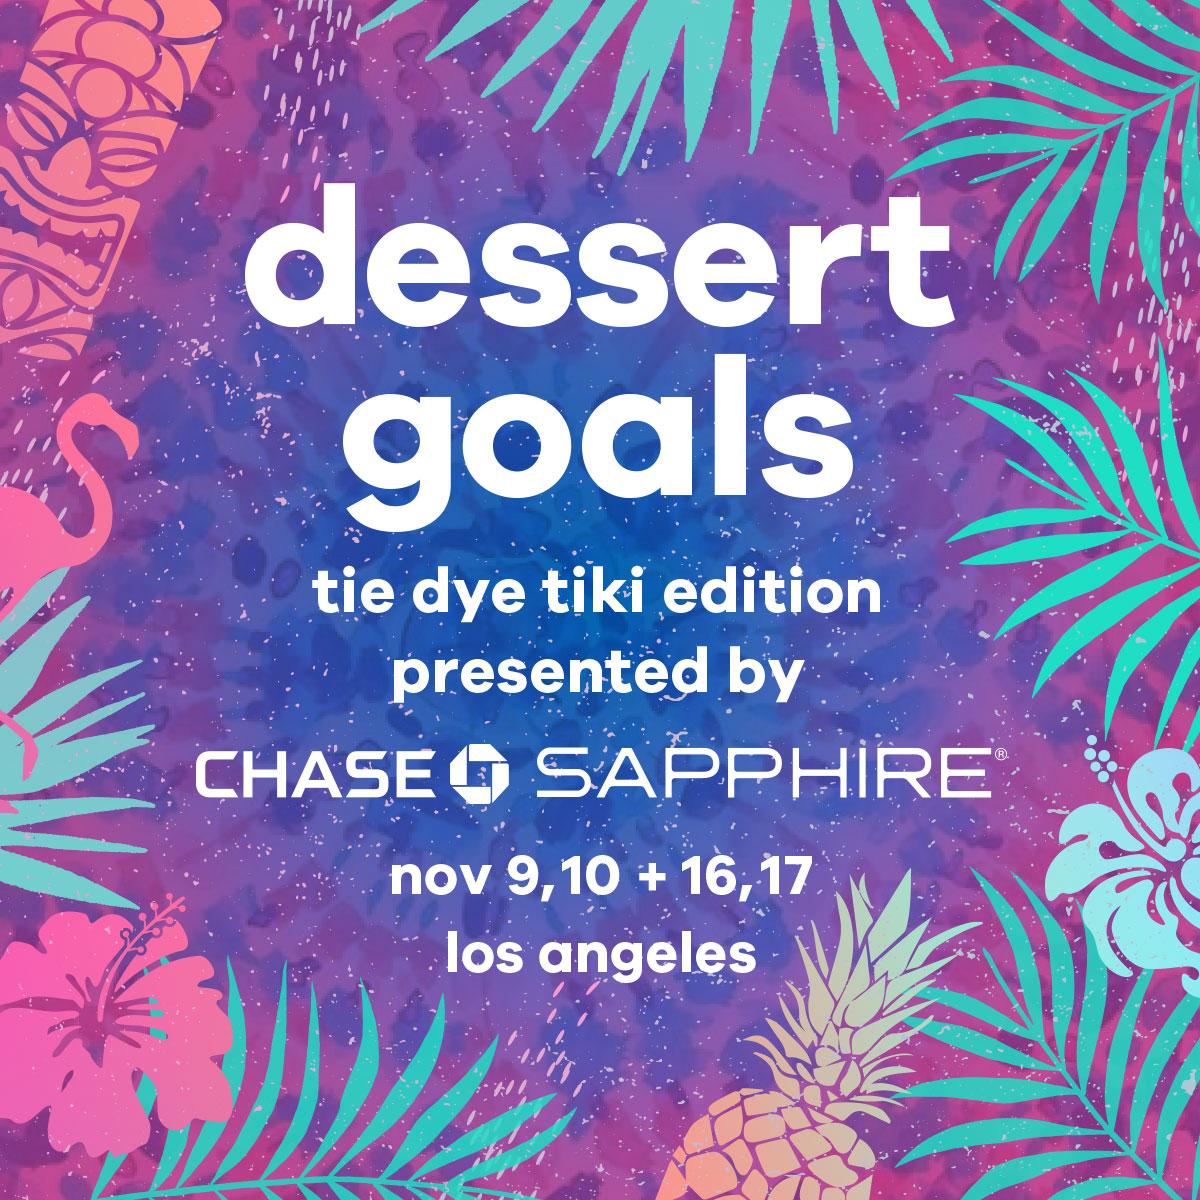 8-17-19-dessert-goals-la-1200x1200 (1).jpg